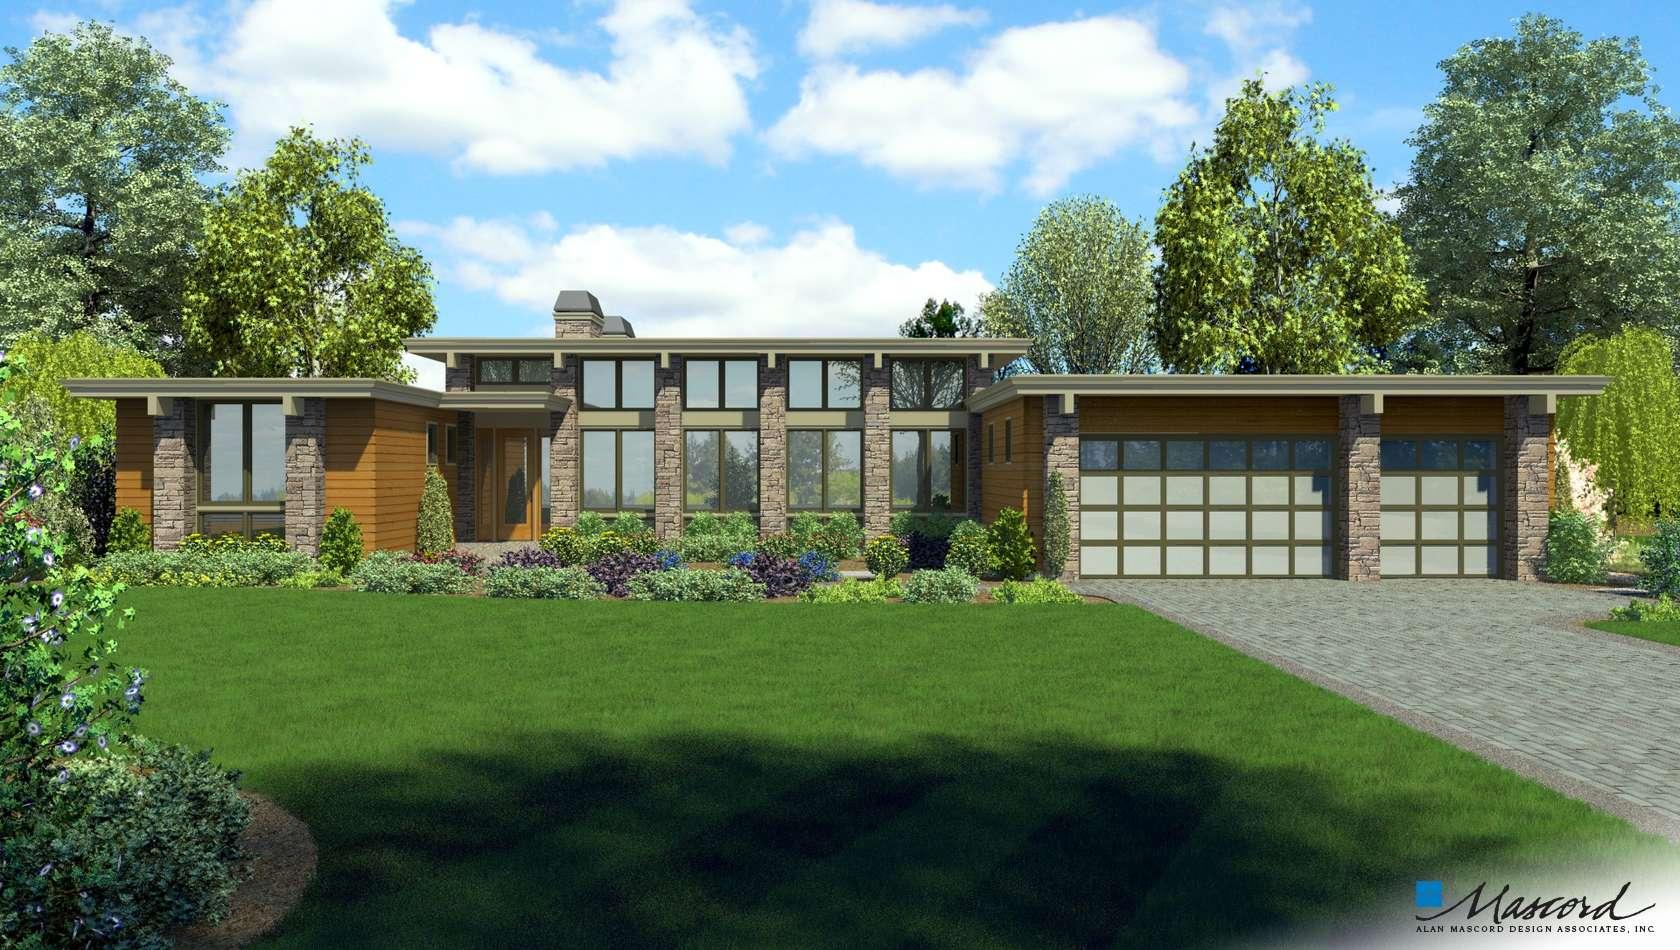 Mascord House Plan 1240C: The Goldsboro